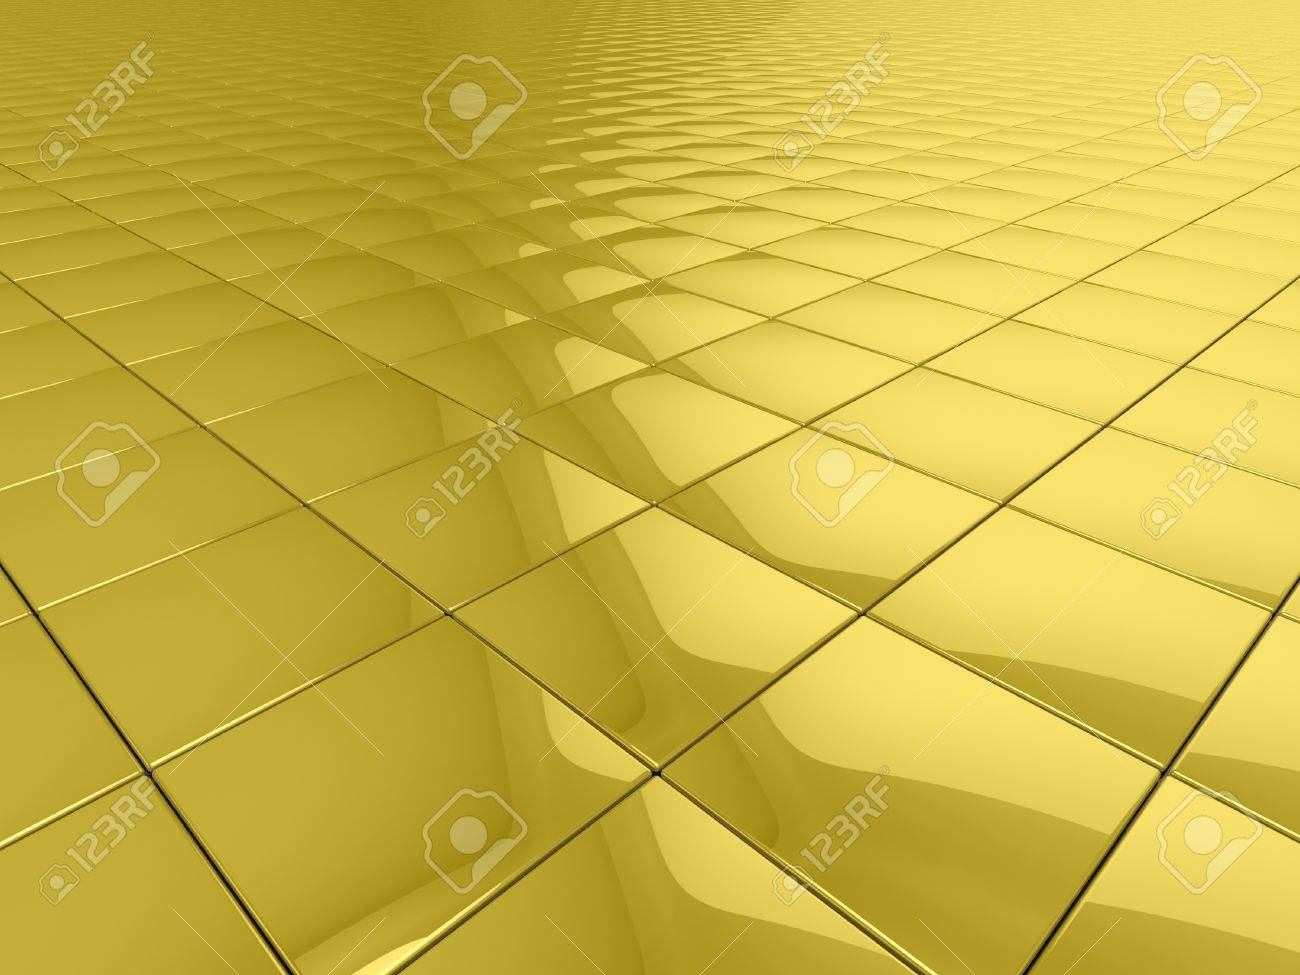 3D tiles background Stock Photo - 18327000